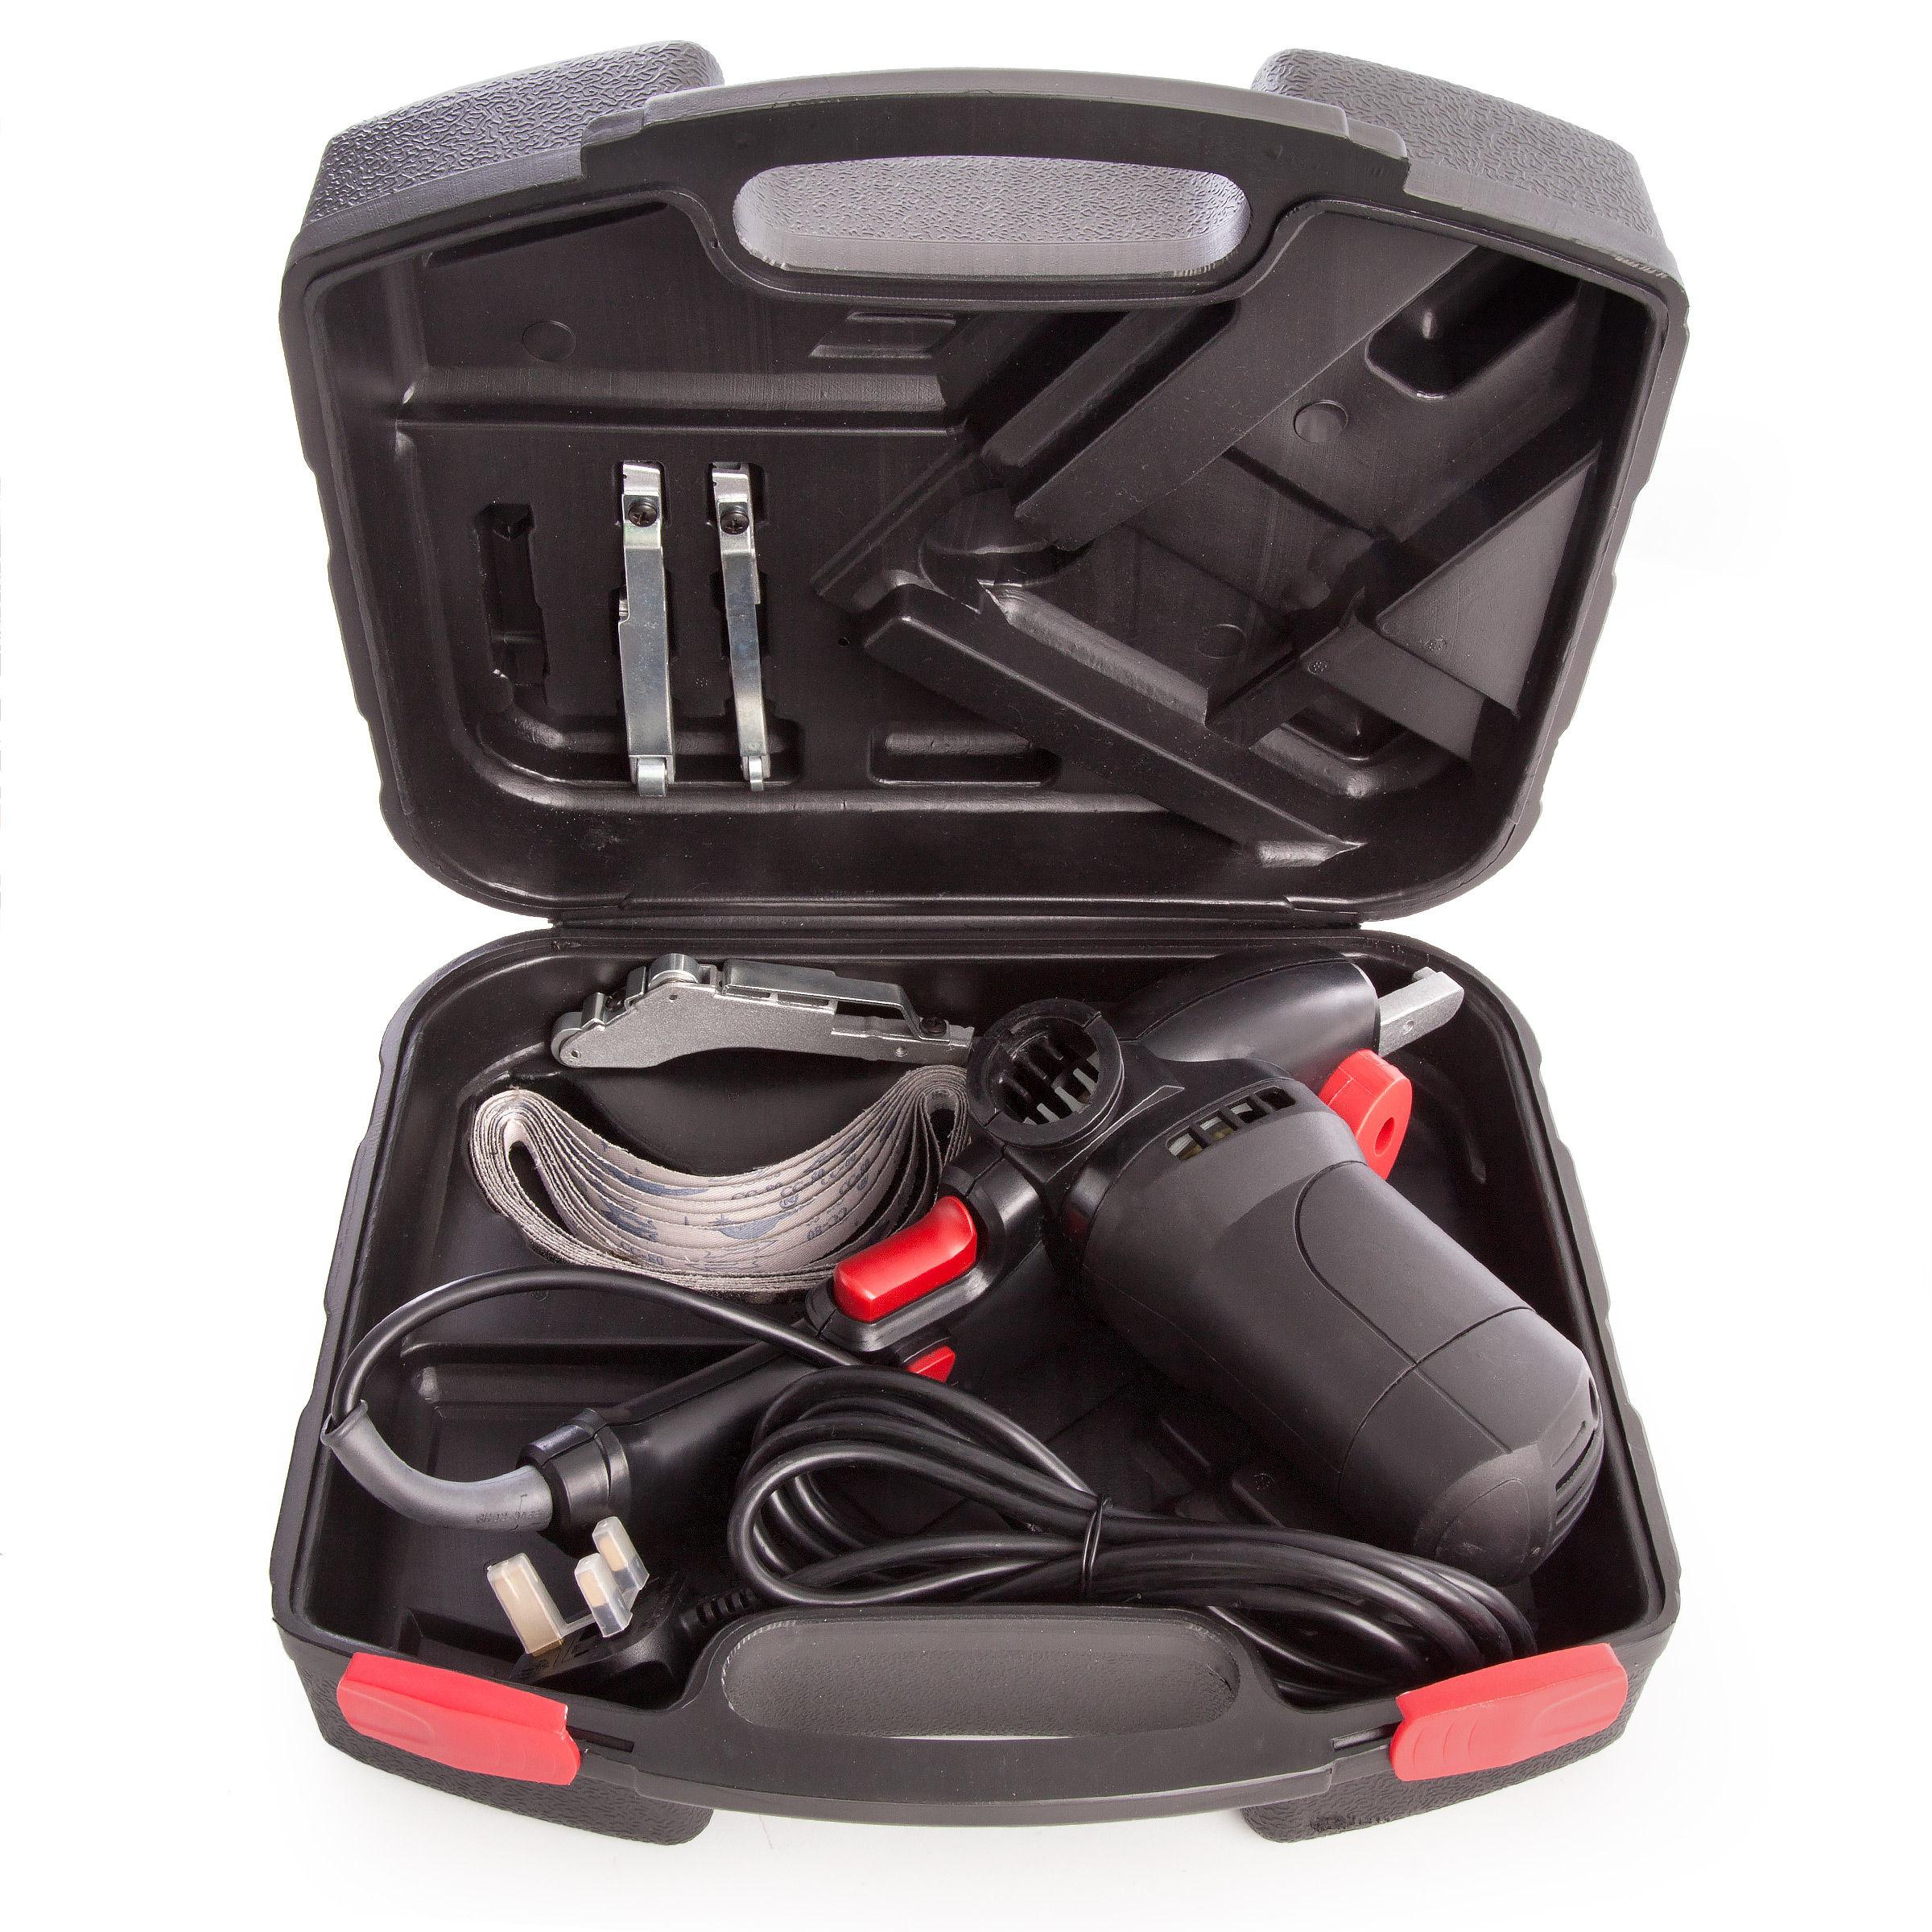 Drive Belt Variator Pulley Roller Set 139QMA 139QMB for Direct Bikes DB50QT-11